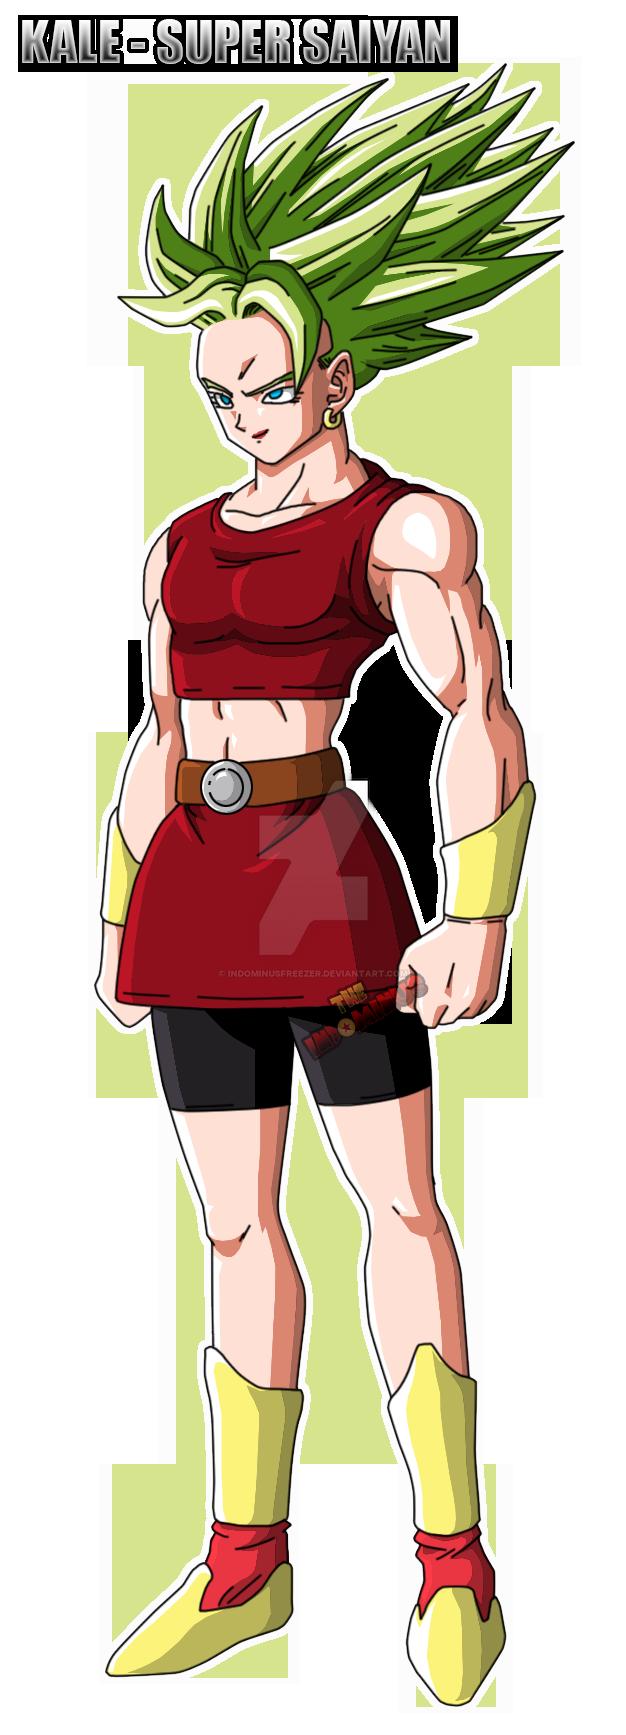 Kale Super Saiyan Dragon Ball Super By Indominusfreezer On Deviantart